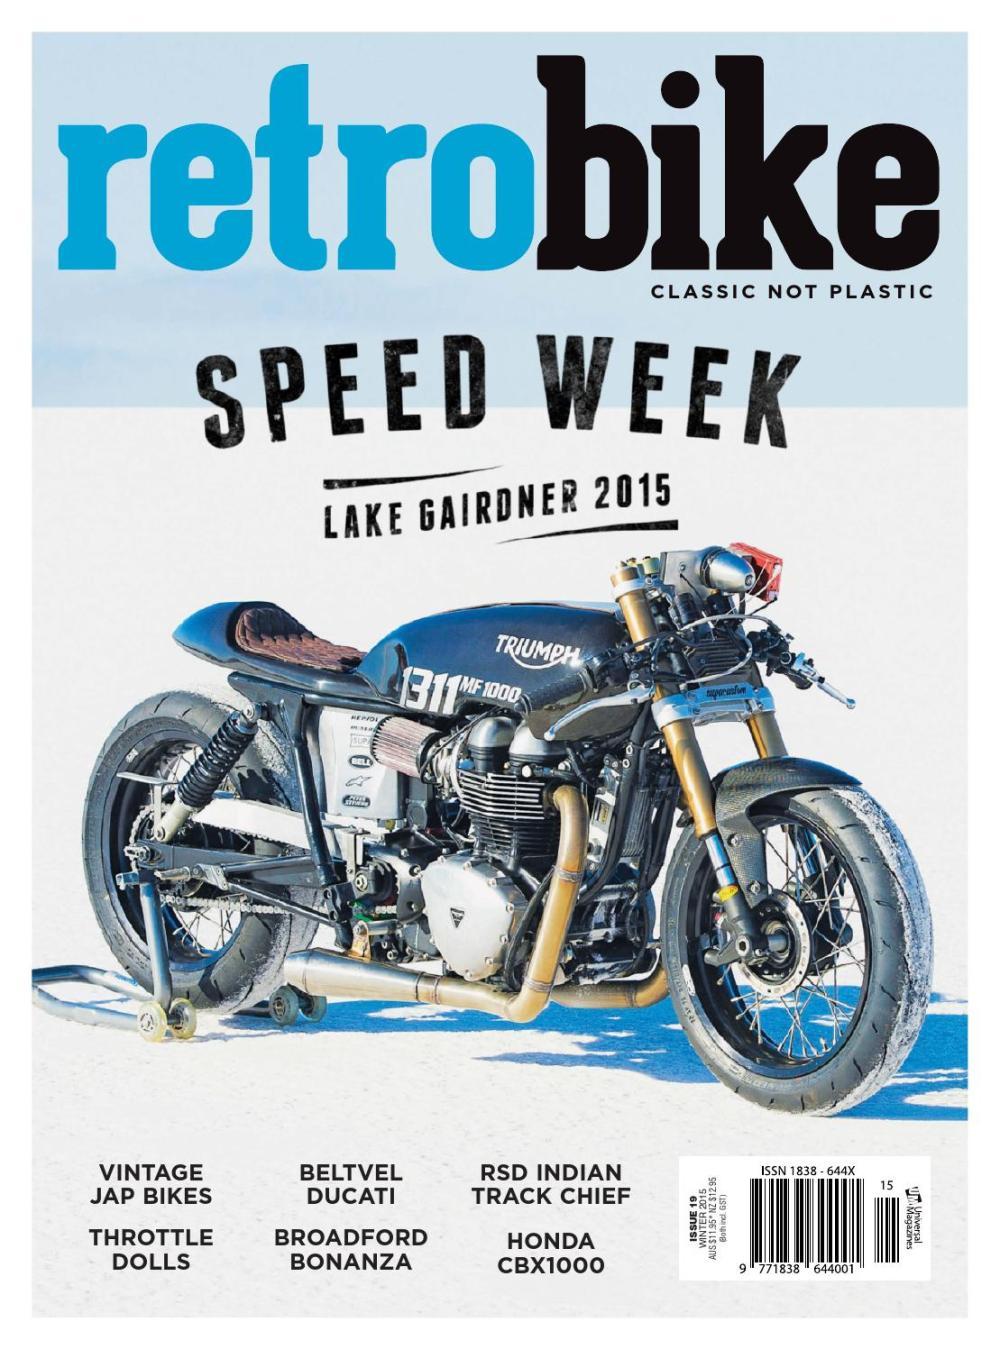 medium resolution of laverda 1000 motorcycle engine diagram